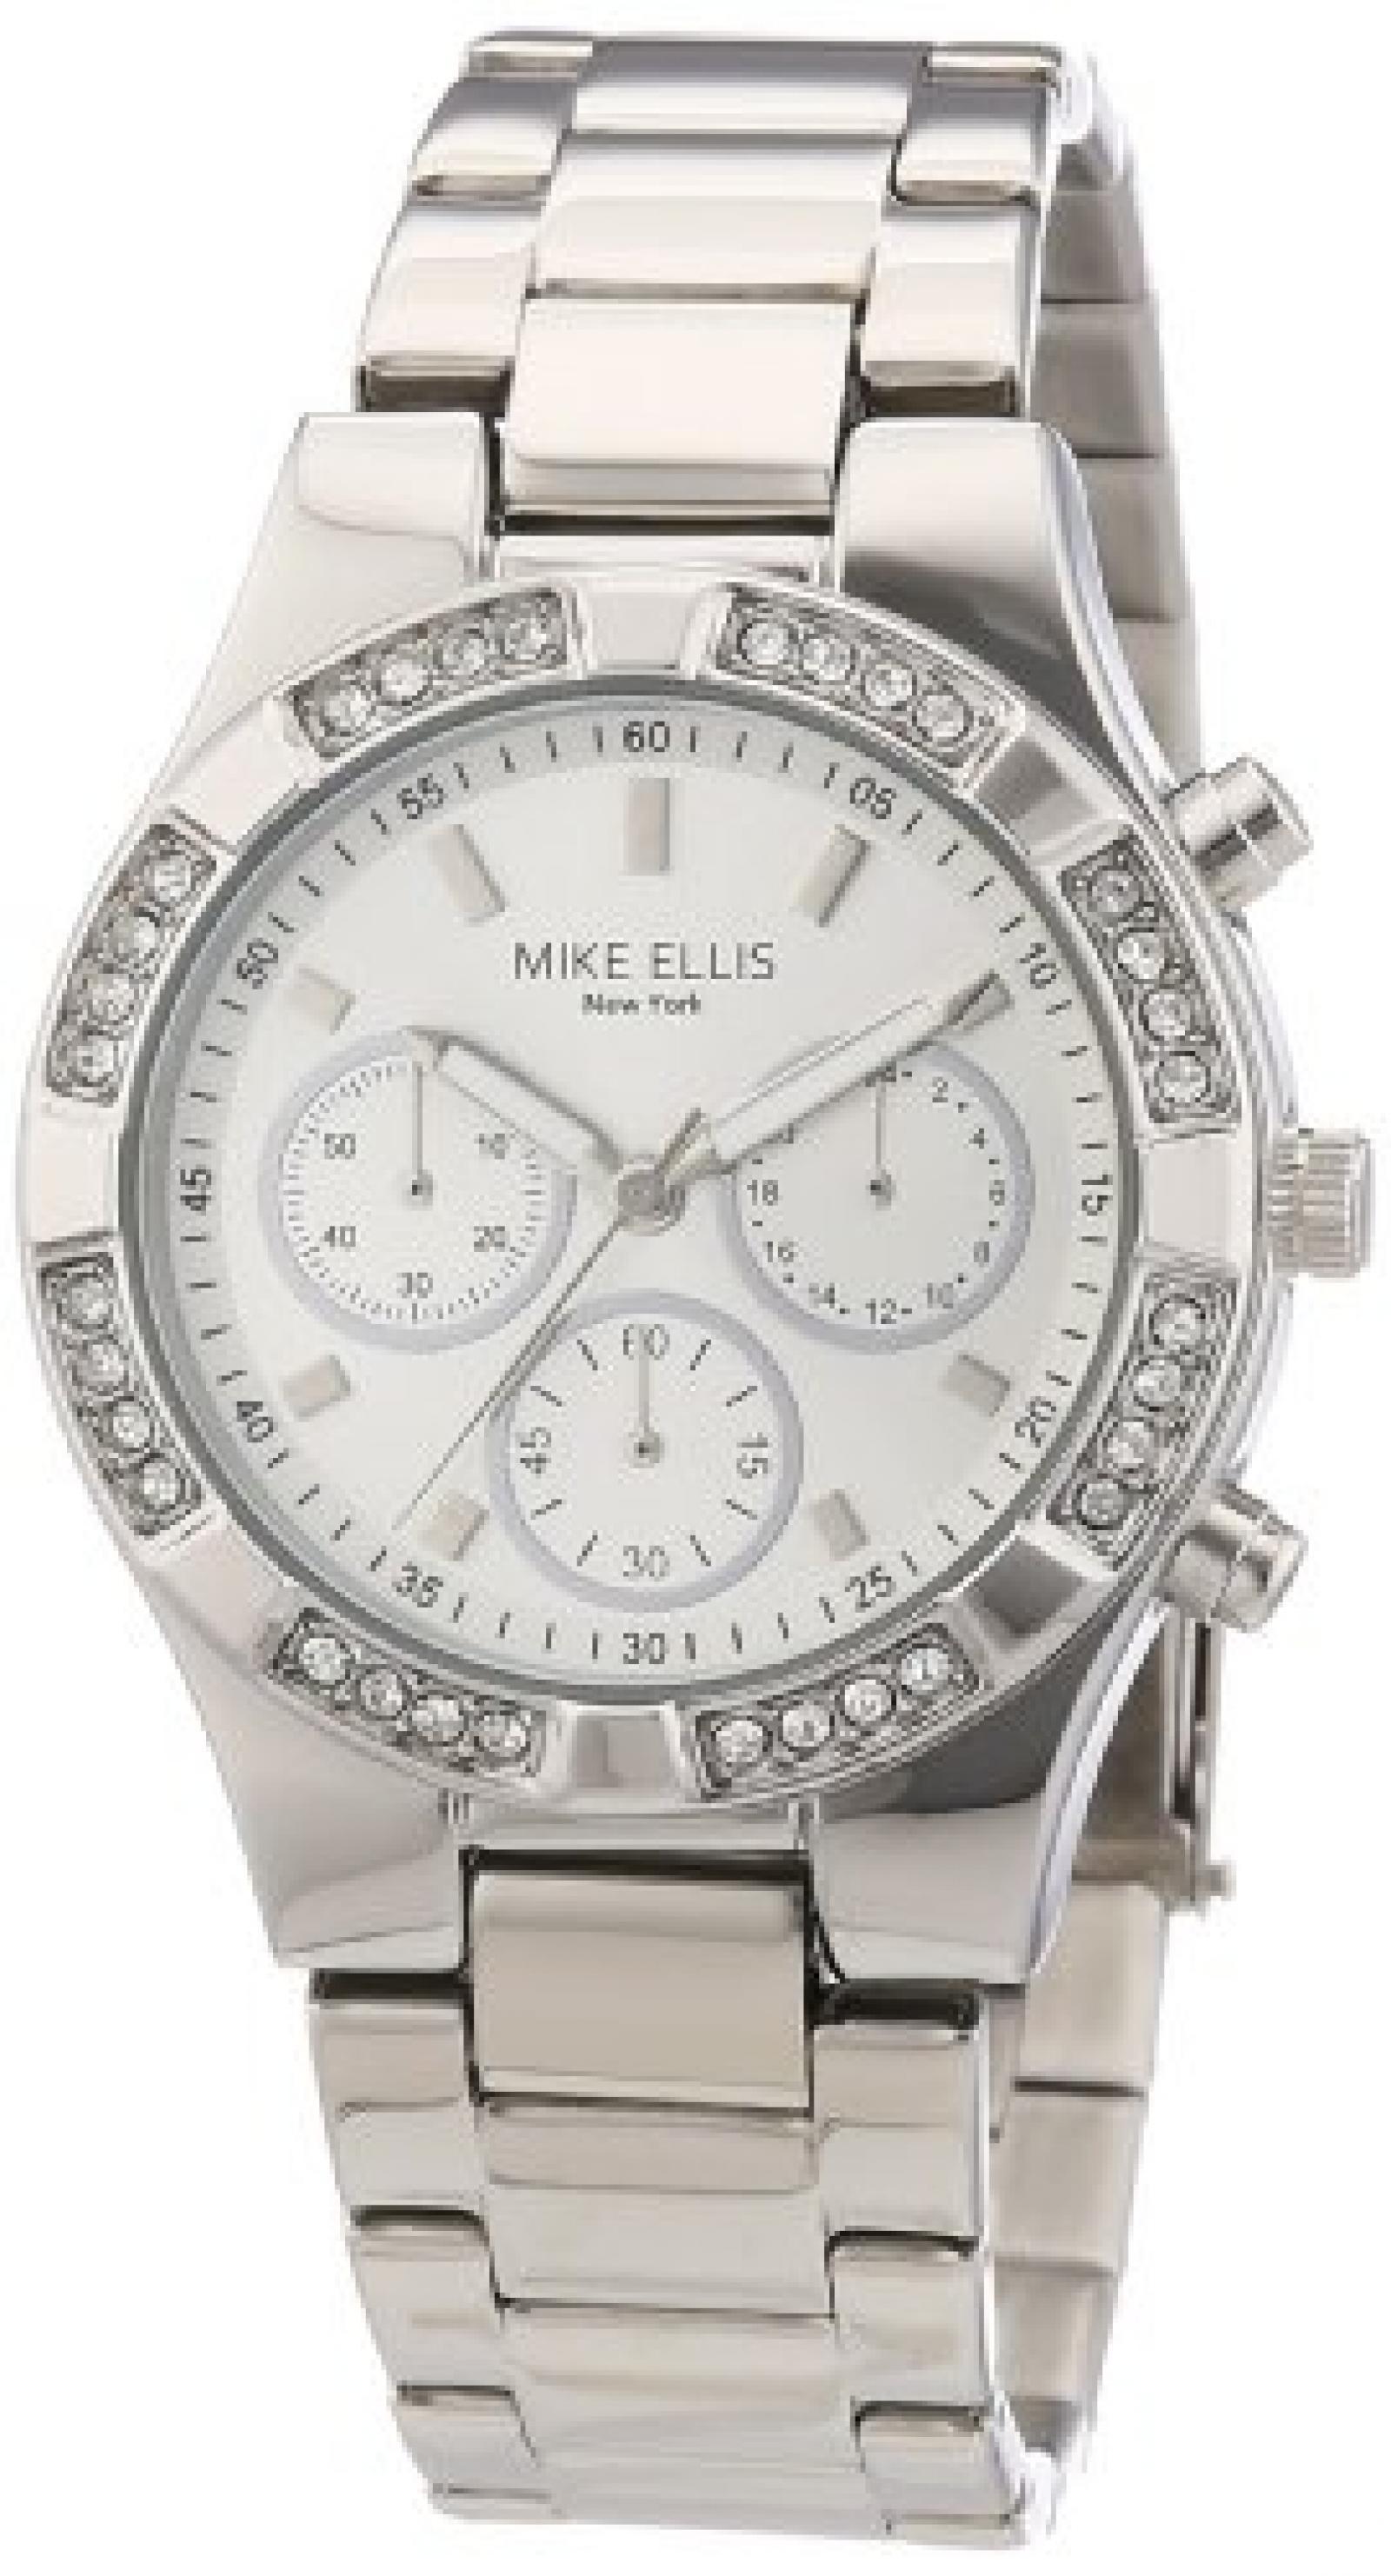 Mike Ellis New York Damen-Armbanduhr XS Analog Quarz Edelstahl L2698ASM